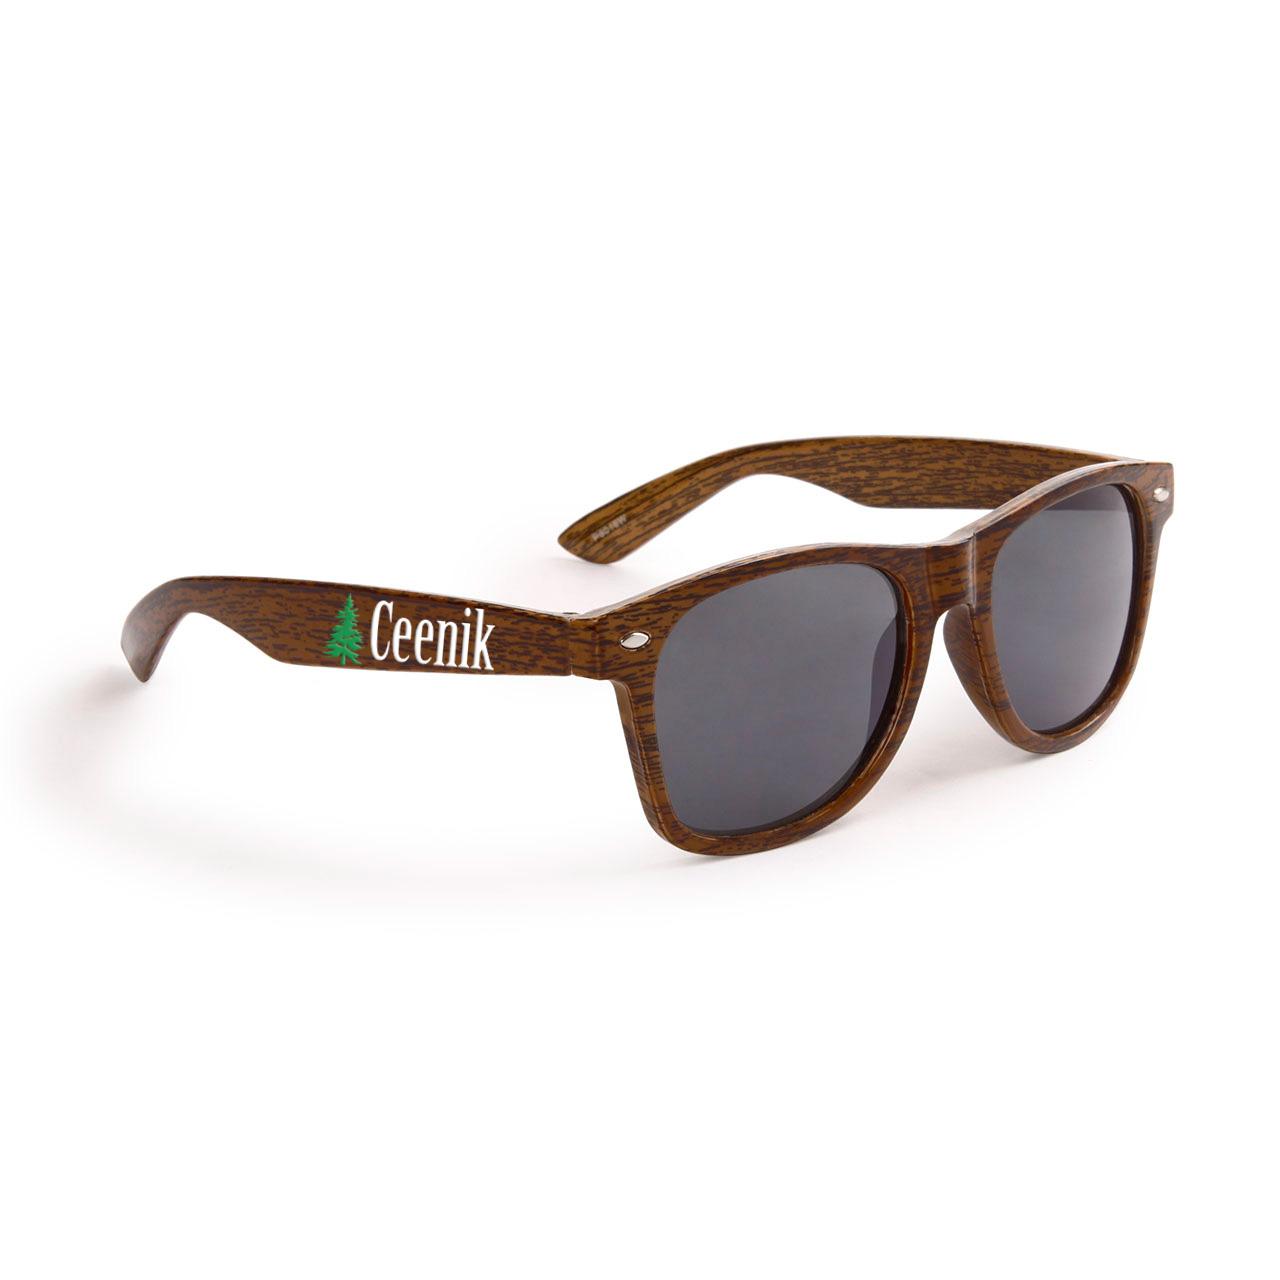 Bulk Sunglasses